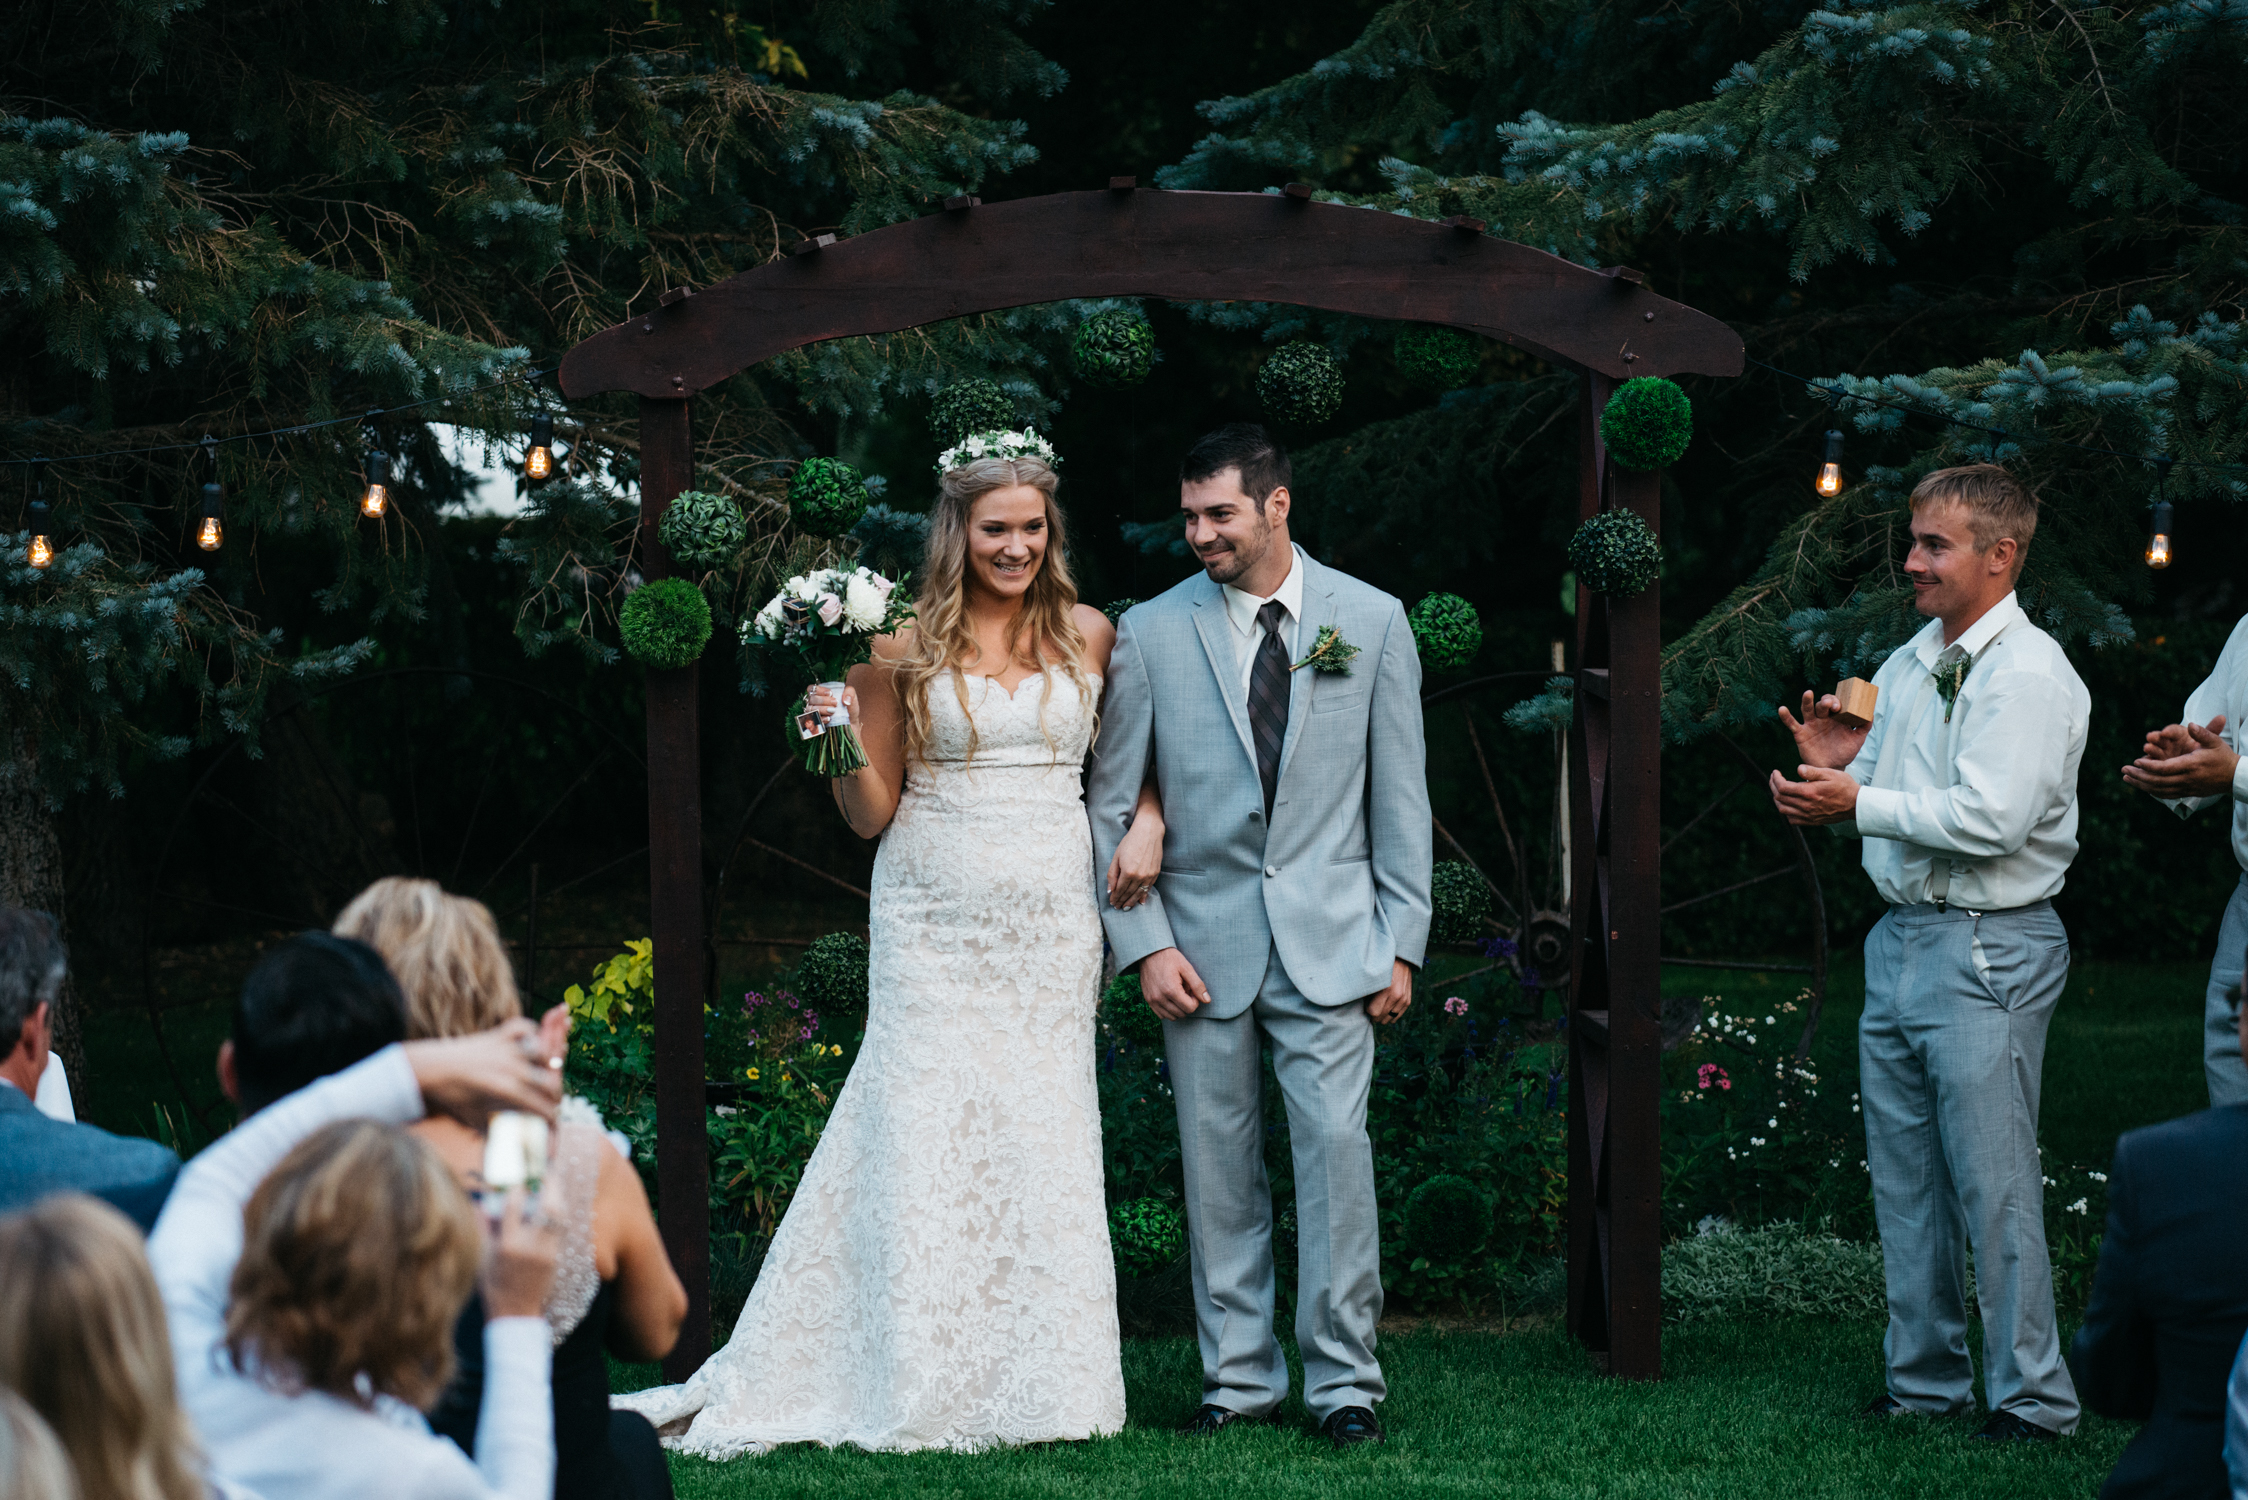 062_saskatoon_saskatchewan_small_town_wedding.jpg